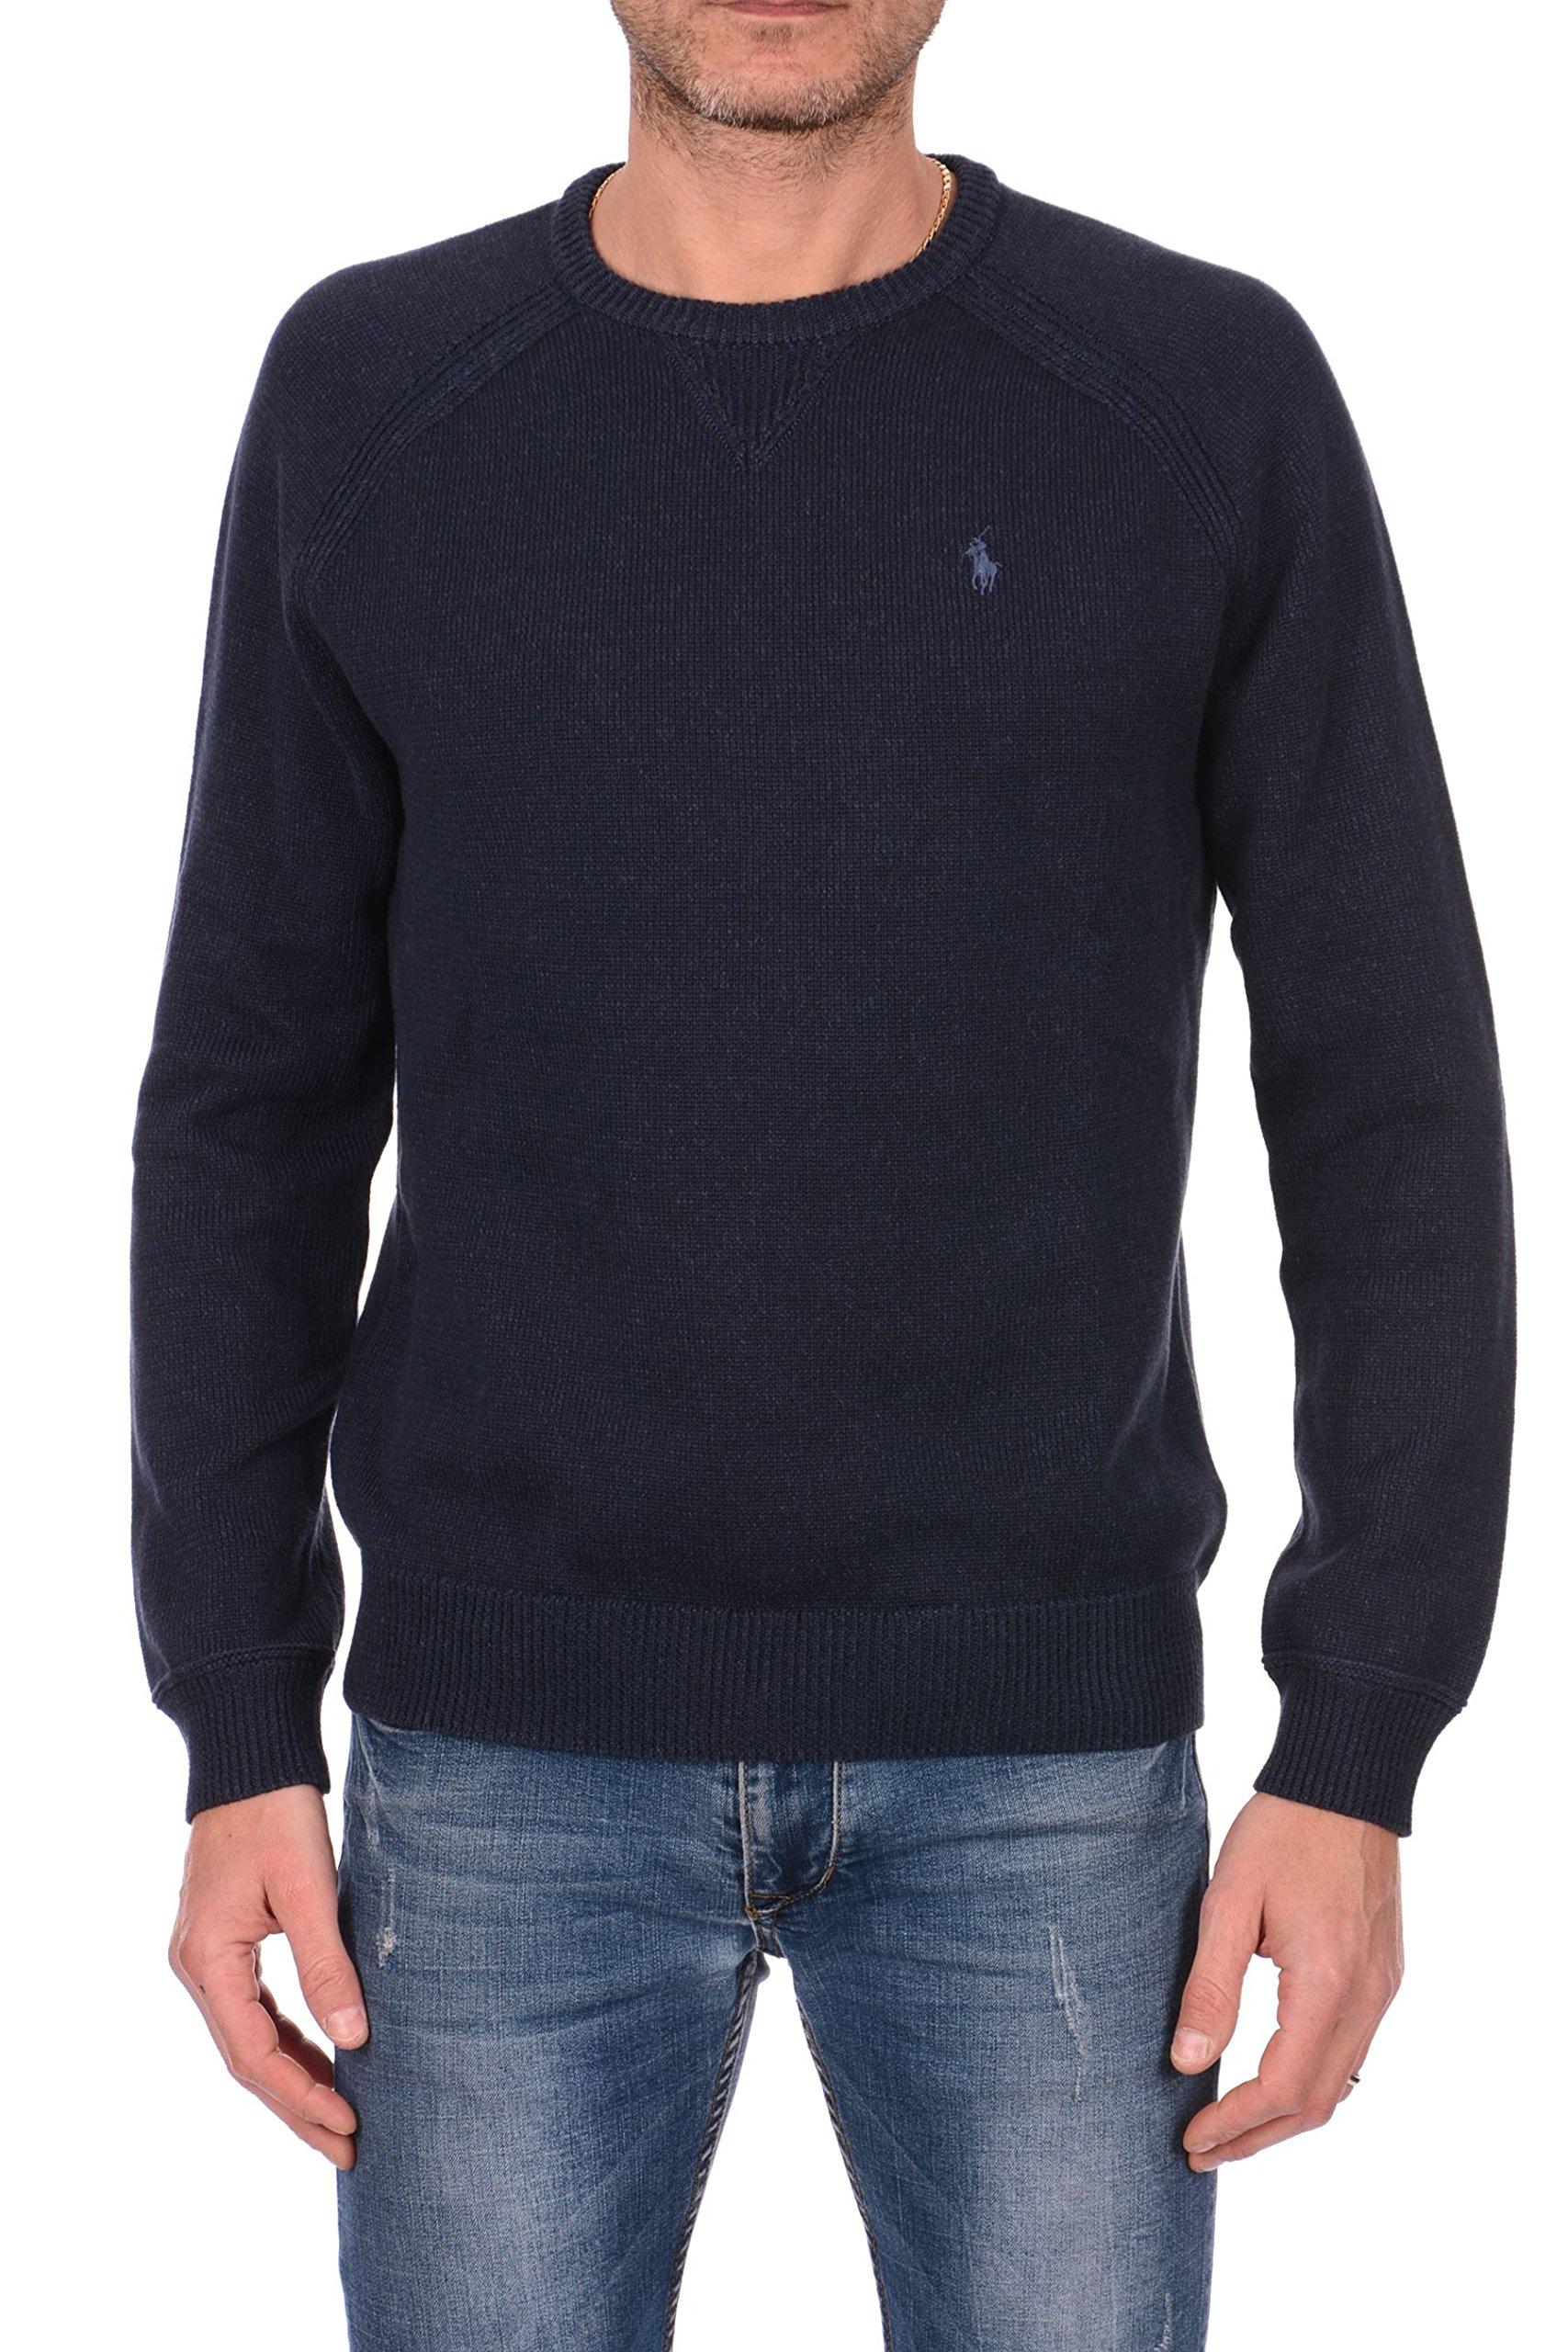 Polo Ralph Lauren Mens Crew Neck Pullover Sweater, Navy Heather, Medium